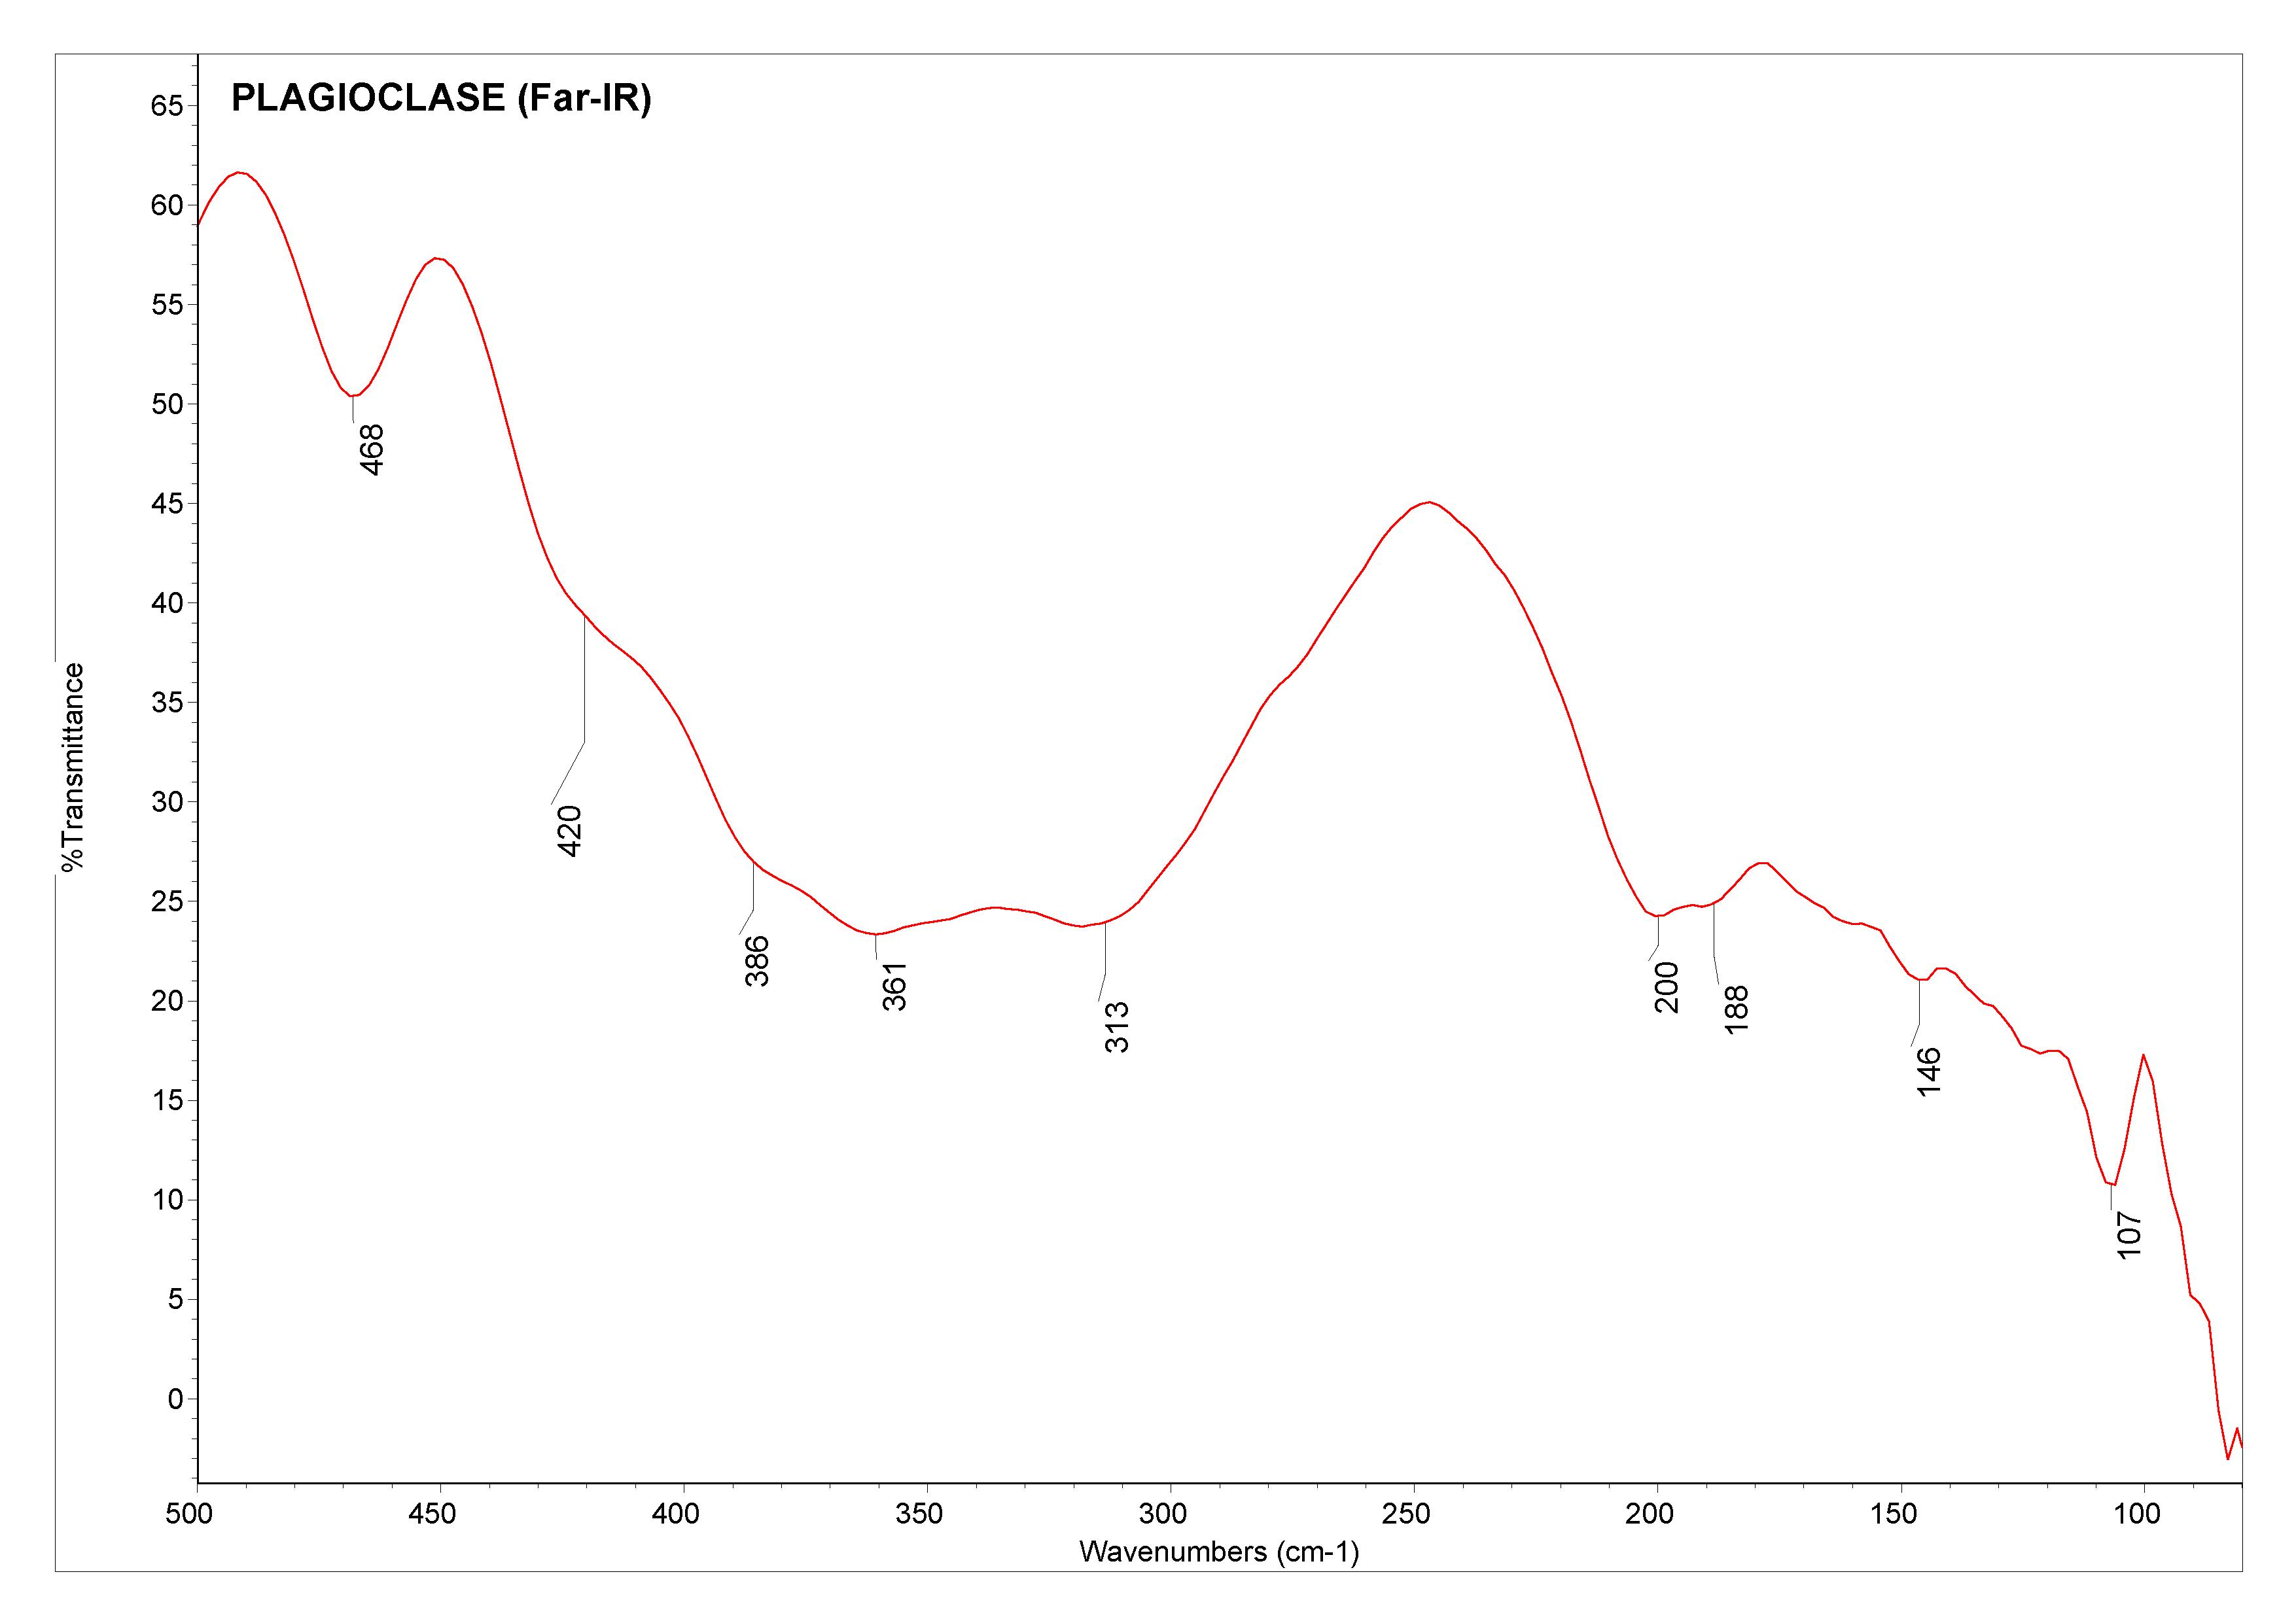 Plagioclase (Far-IR)